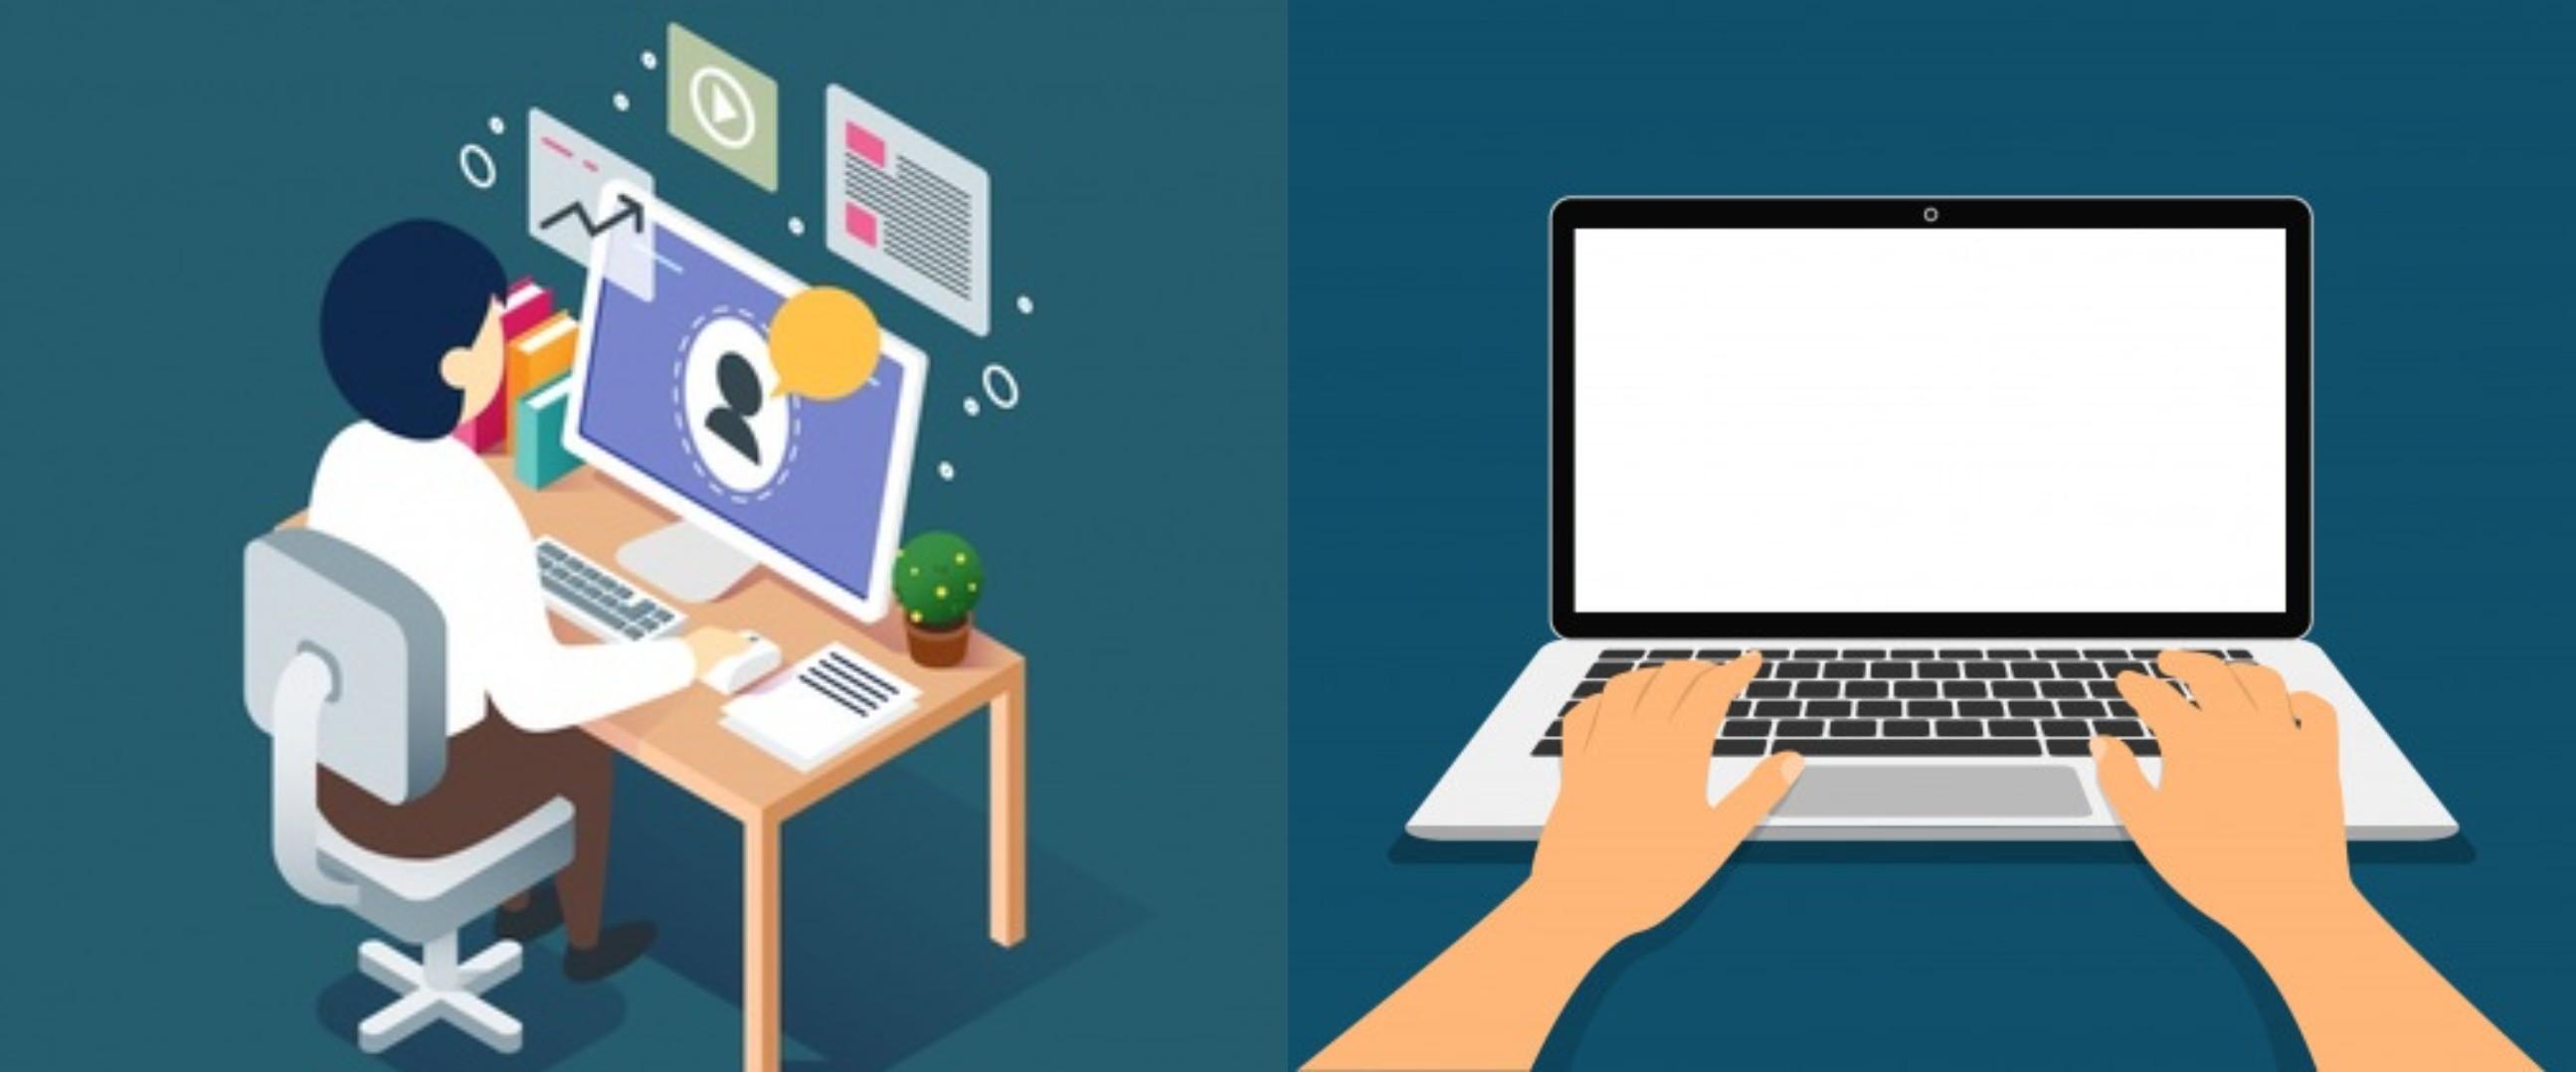 8 Cara screenshot di laptop dan komputer, mudah serta tanpa ribet